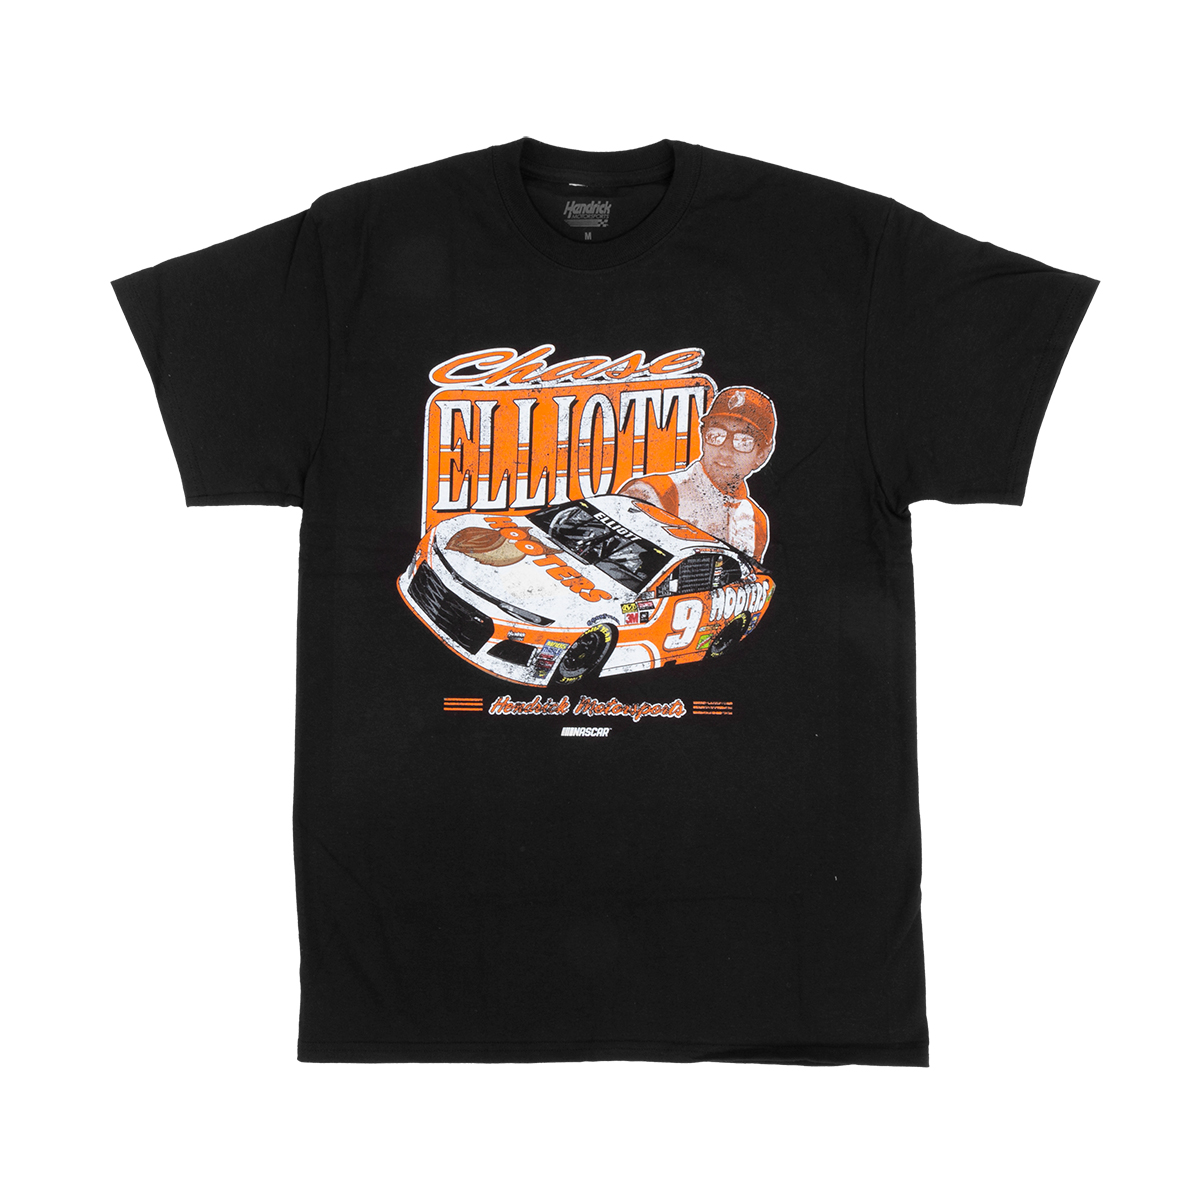 Chase Elliott 2018 #9 Hooters Vintage 1-spot T-shirt